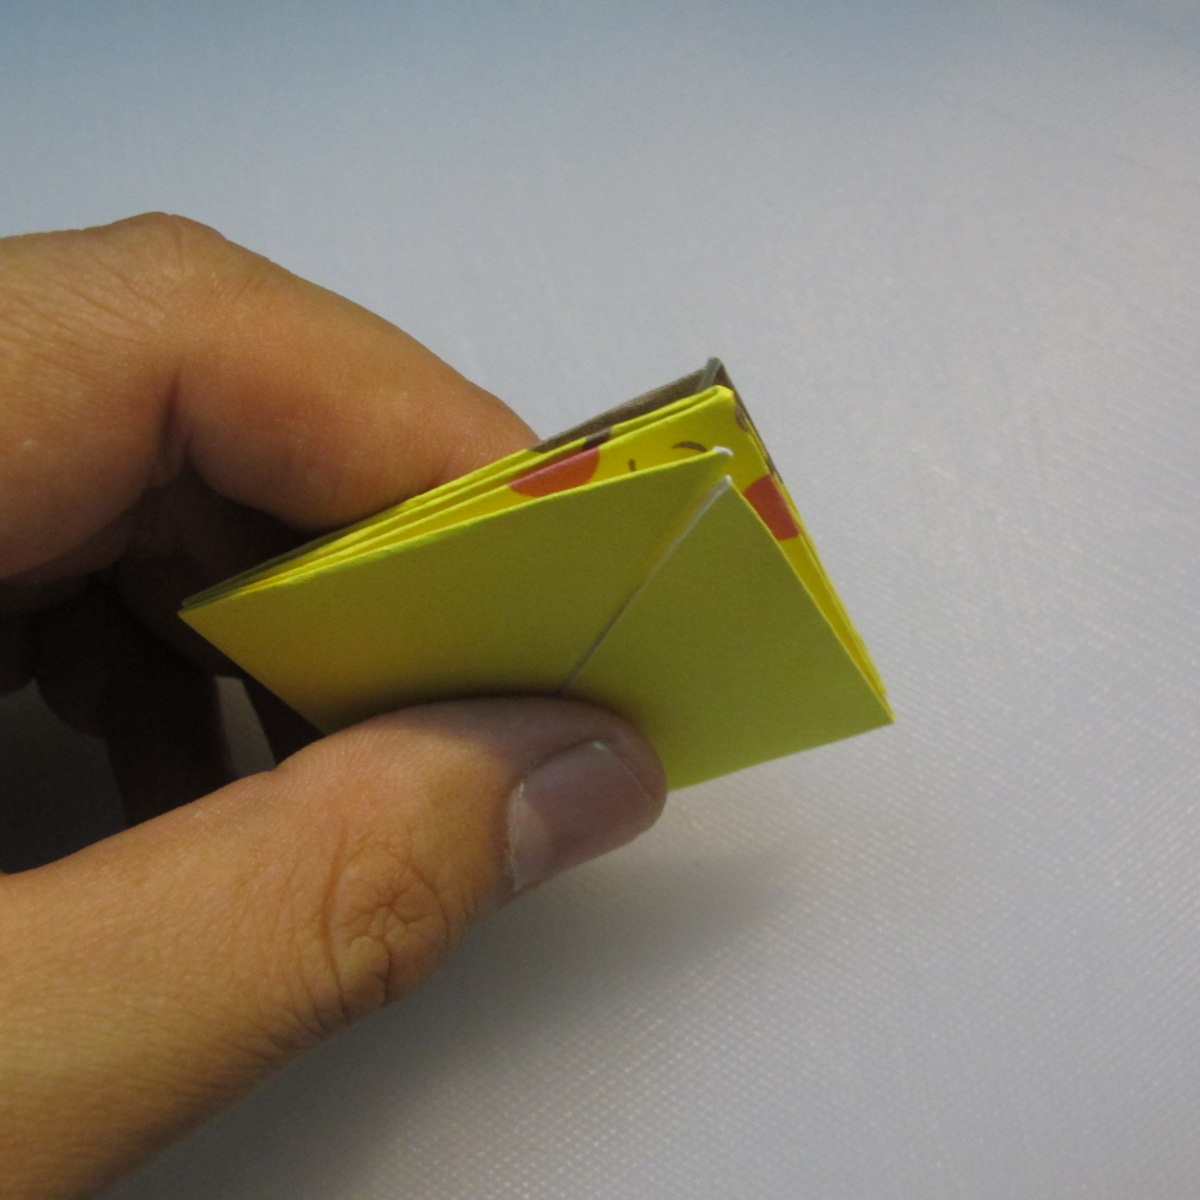 mookeep-วิธีพับกระดาษเป็นรูปปิกาจู-01-010